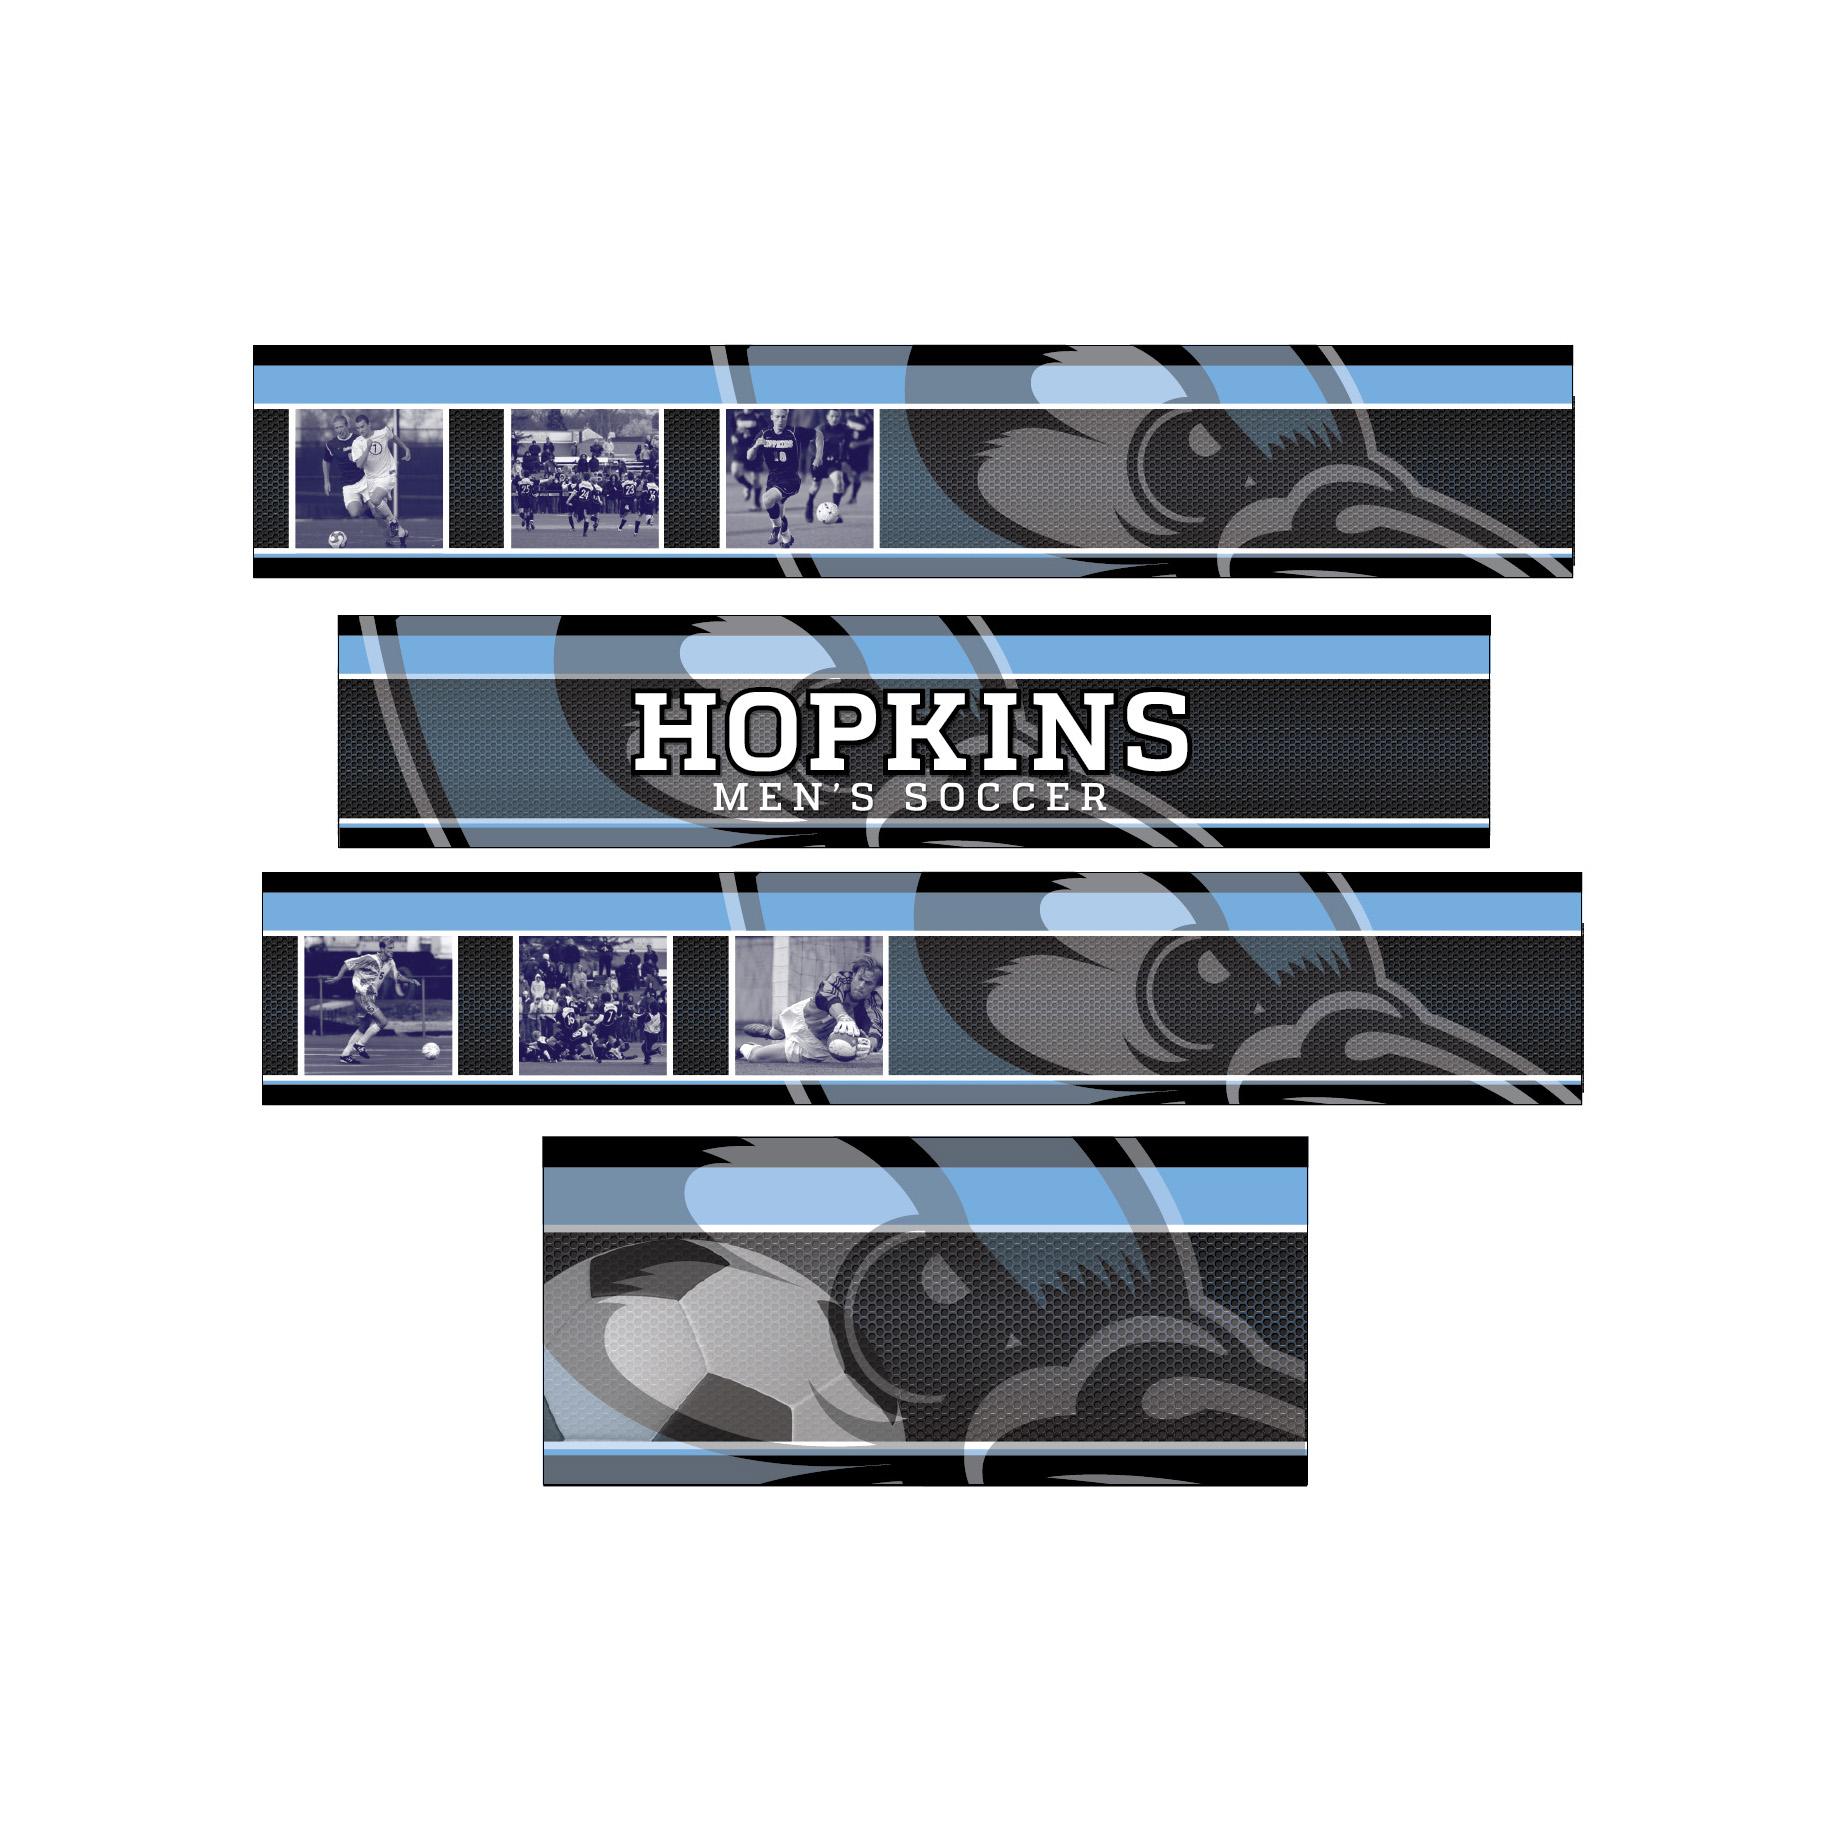 HOPKINS.jpg